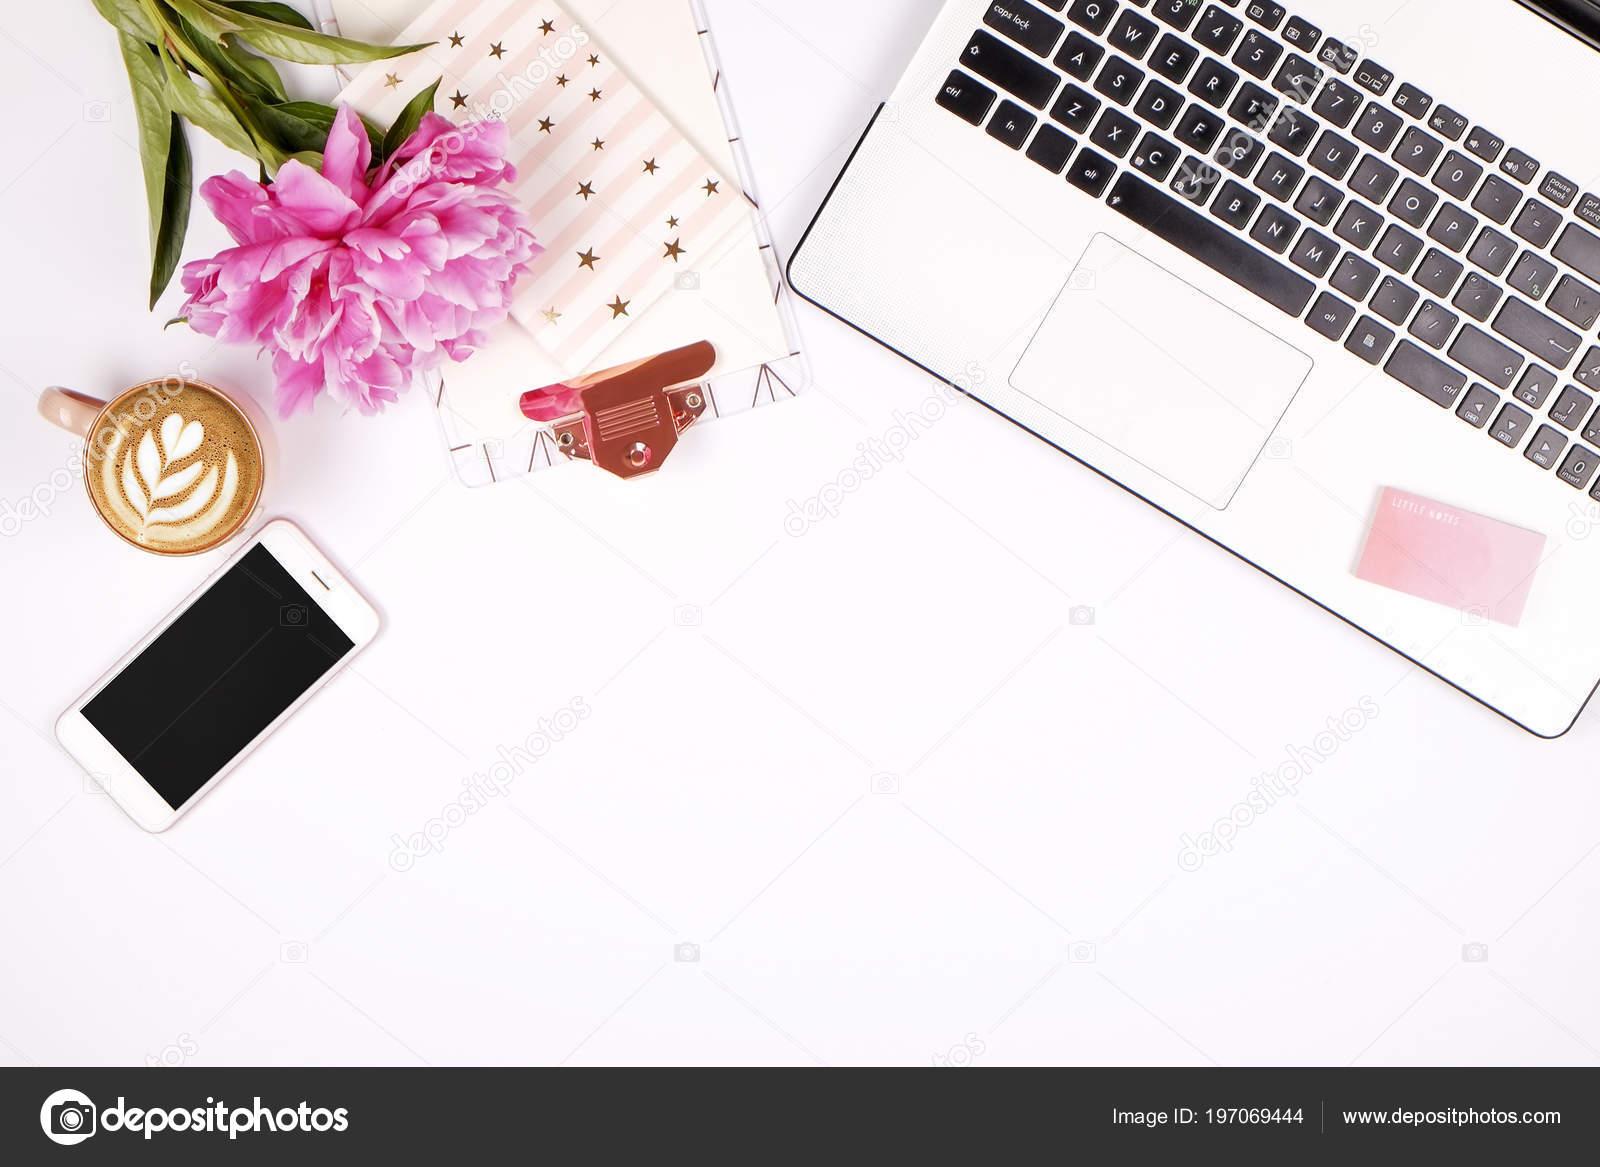 Girly Office Desktop Backgrounds - HD Wallpaper